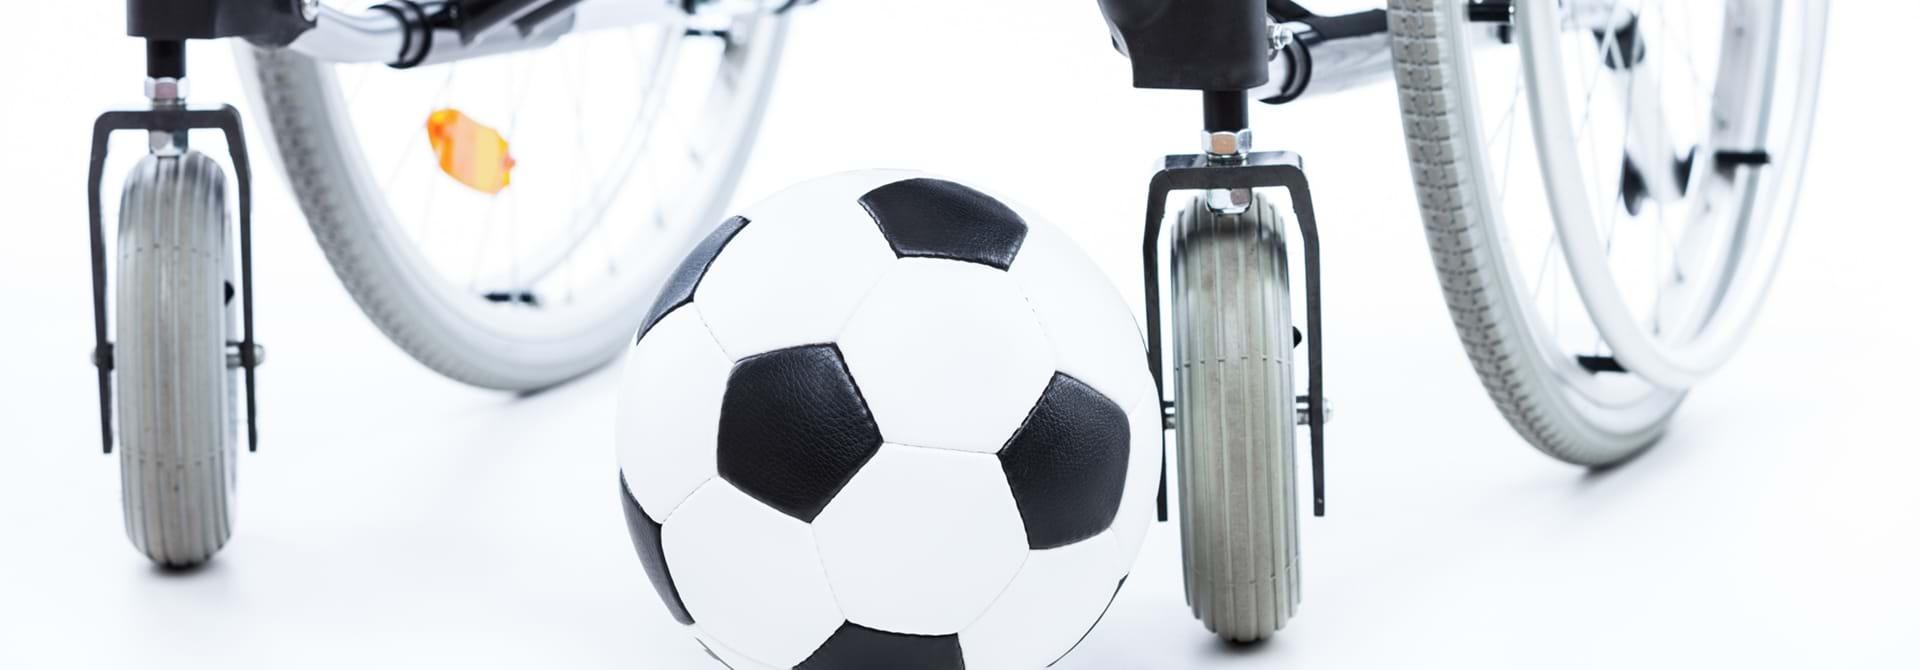 Fodbold Koerestol Web